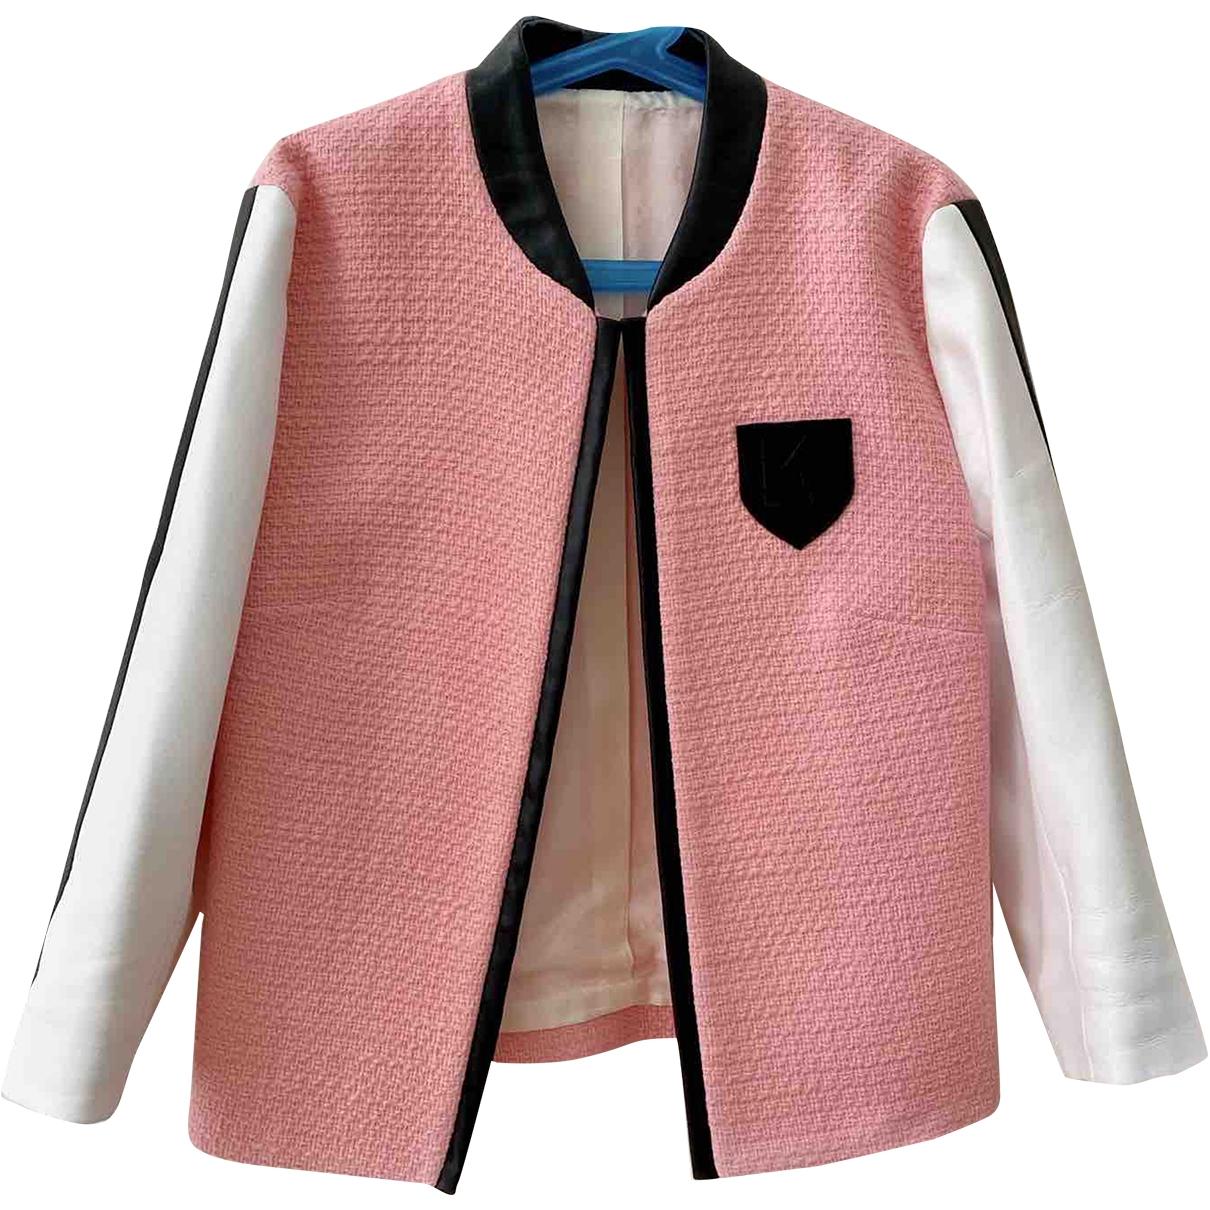 Karl \N Multicolour Cotton jacket for Women 38 IT